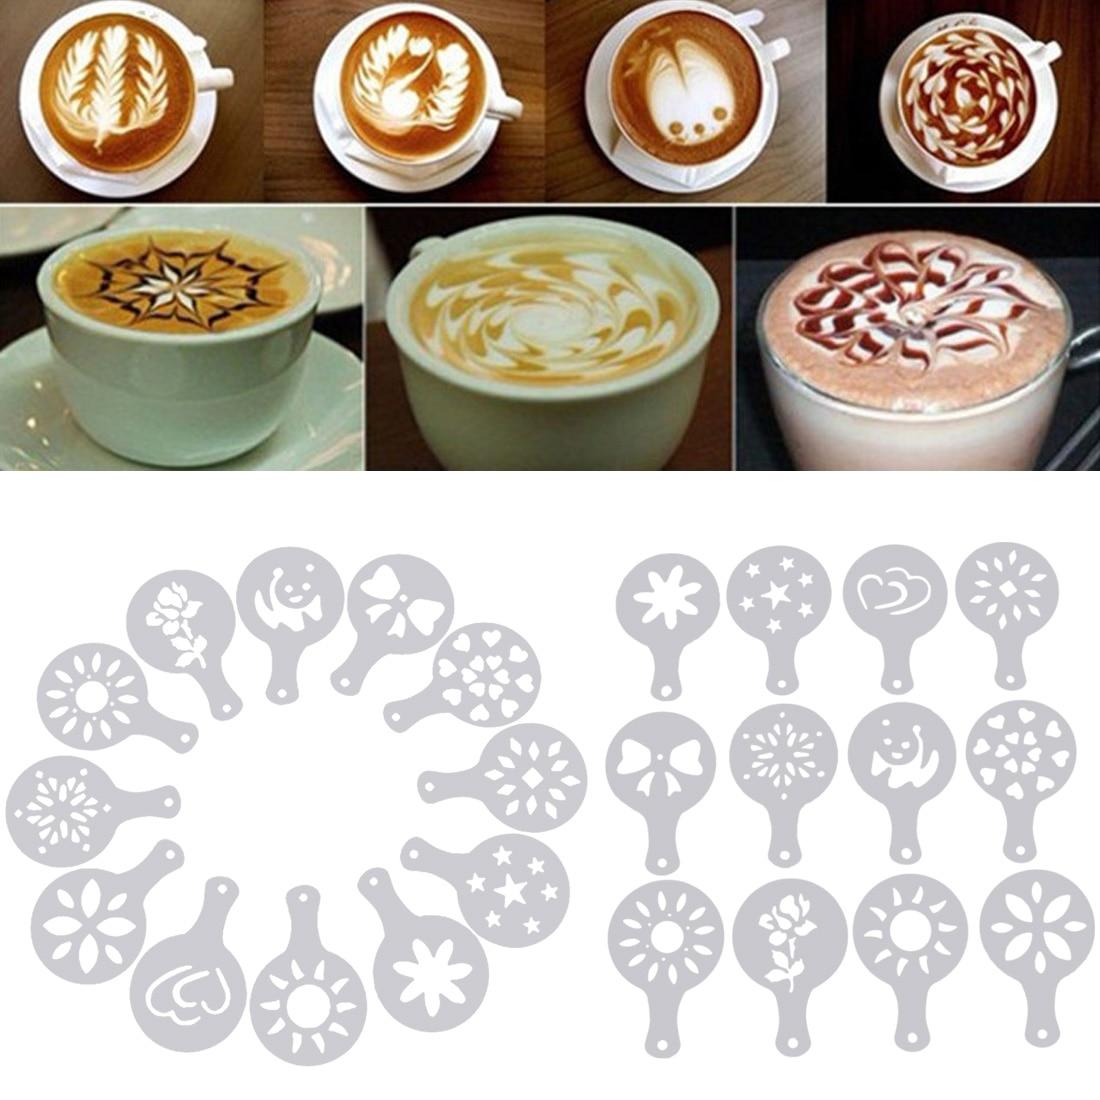 12pc/set Cartoon Heart-shaped Mold Coffee Stencils Milk Cake Dessert Cappuccino Template Strew Pad Duster Spray Tools